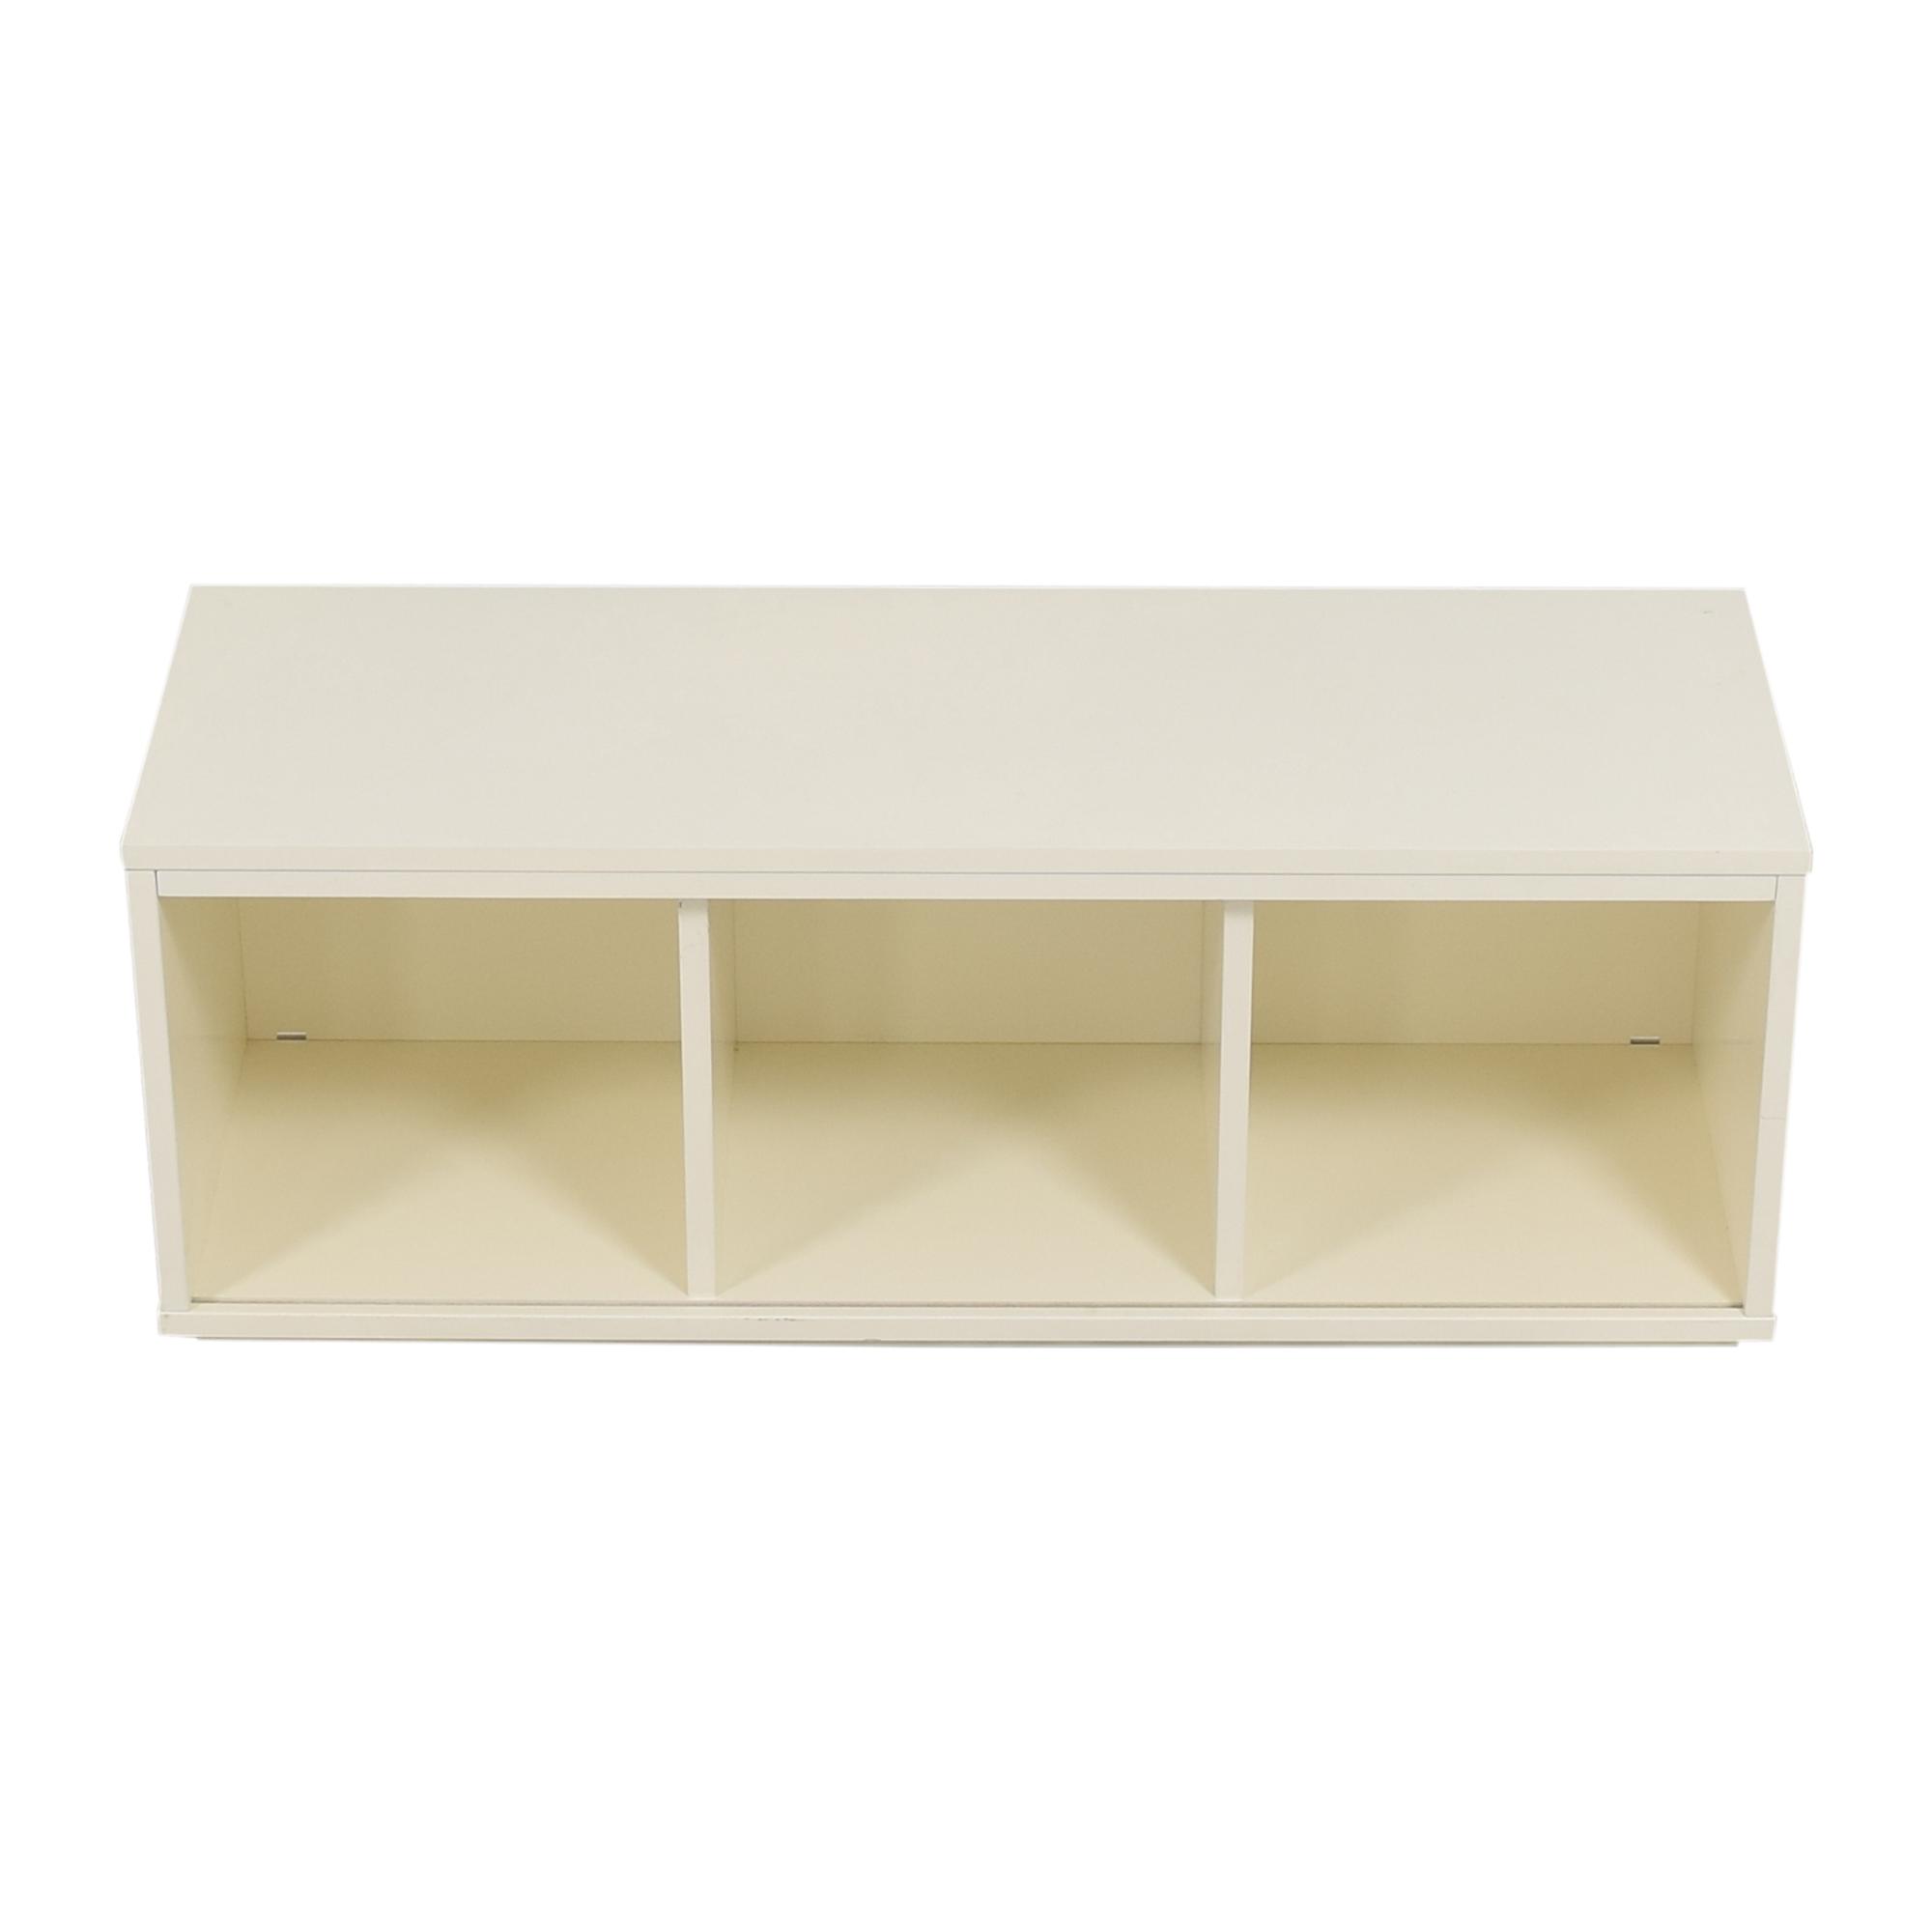 shop Crate & Barrel District Three-Cube Stackable Bookcase Crate & Barrel Bookcases & Shelving